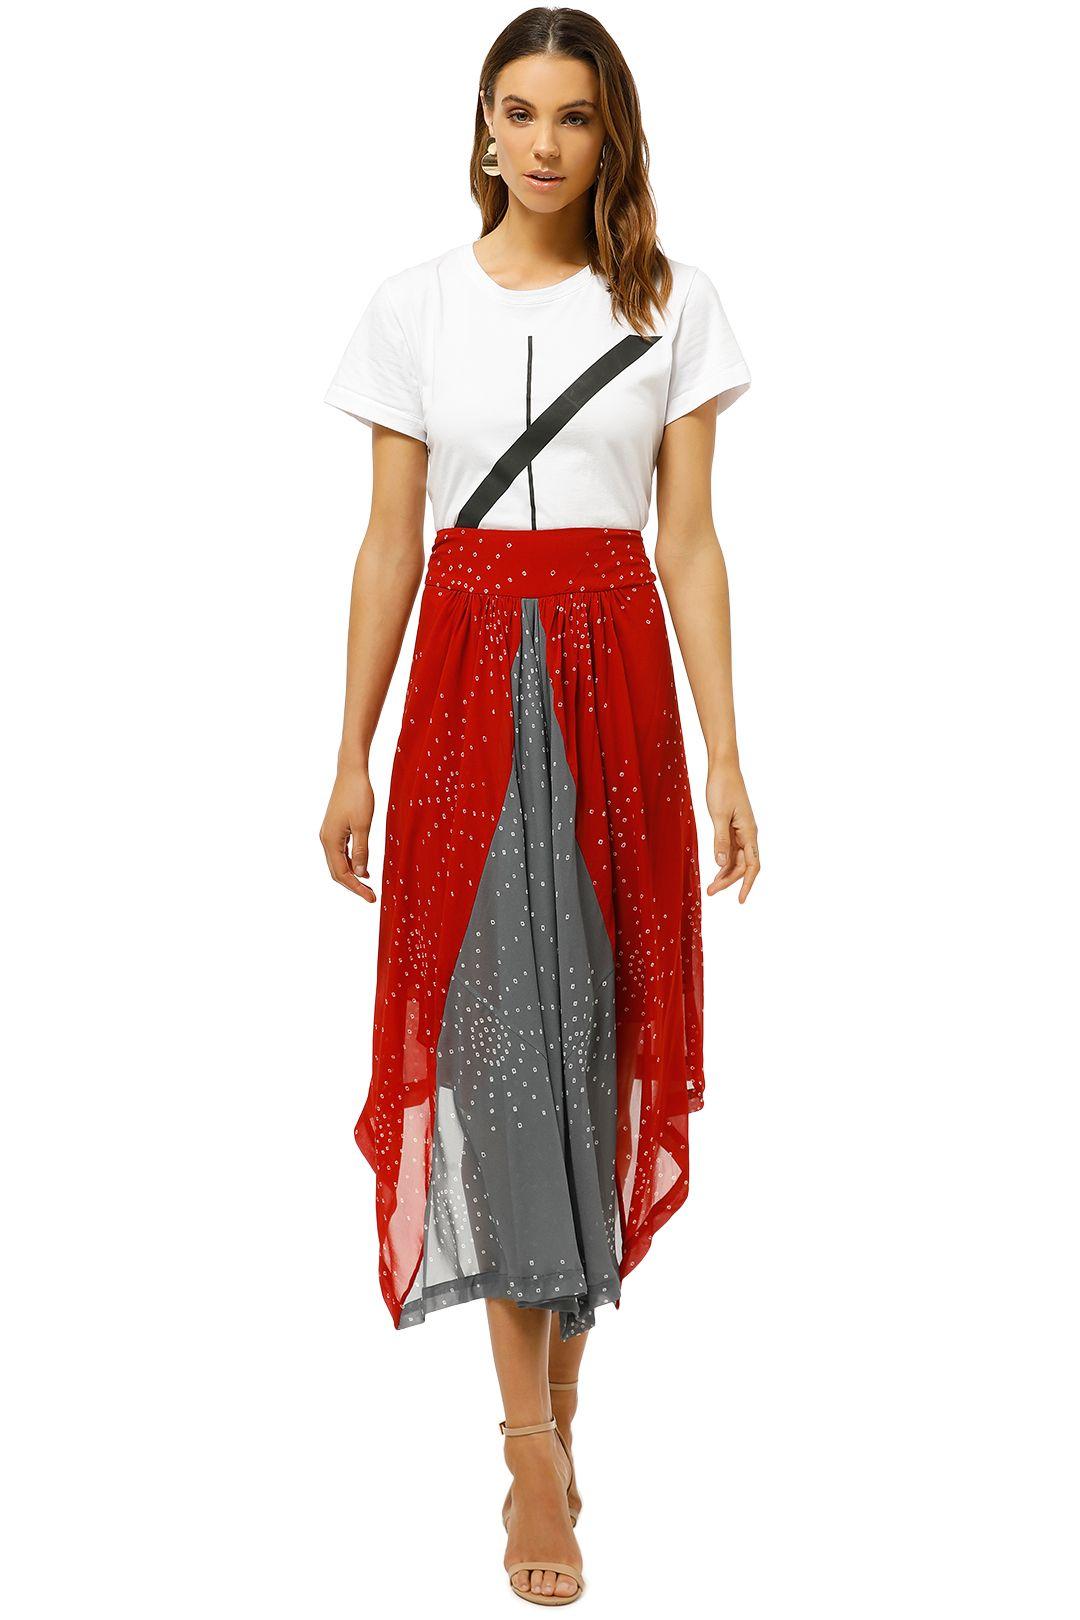 KITX-Galaxy-Waterfall-Skirt-Red-Grey-Front